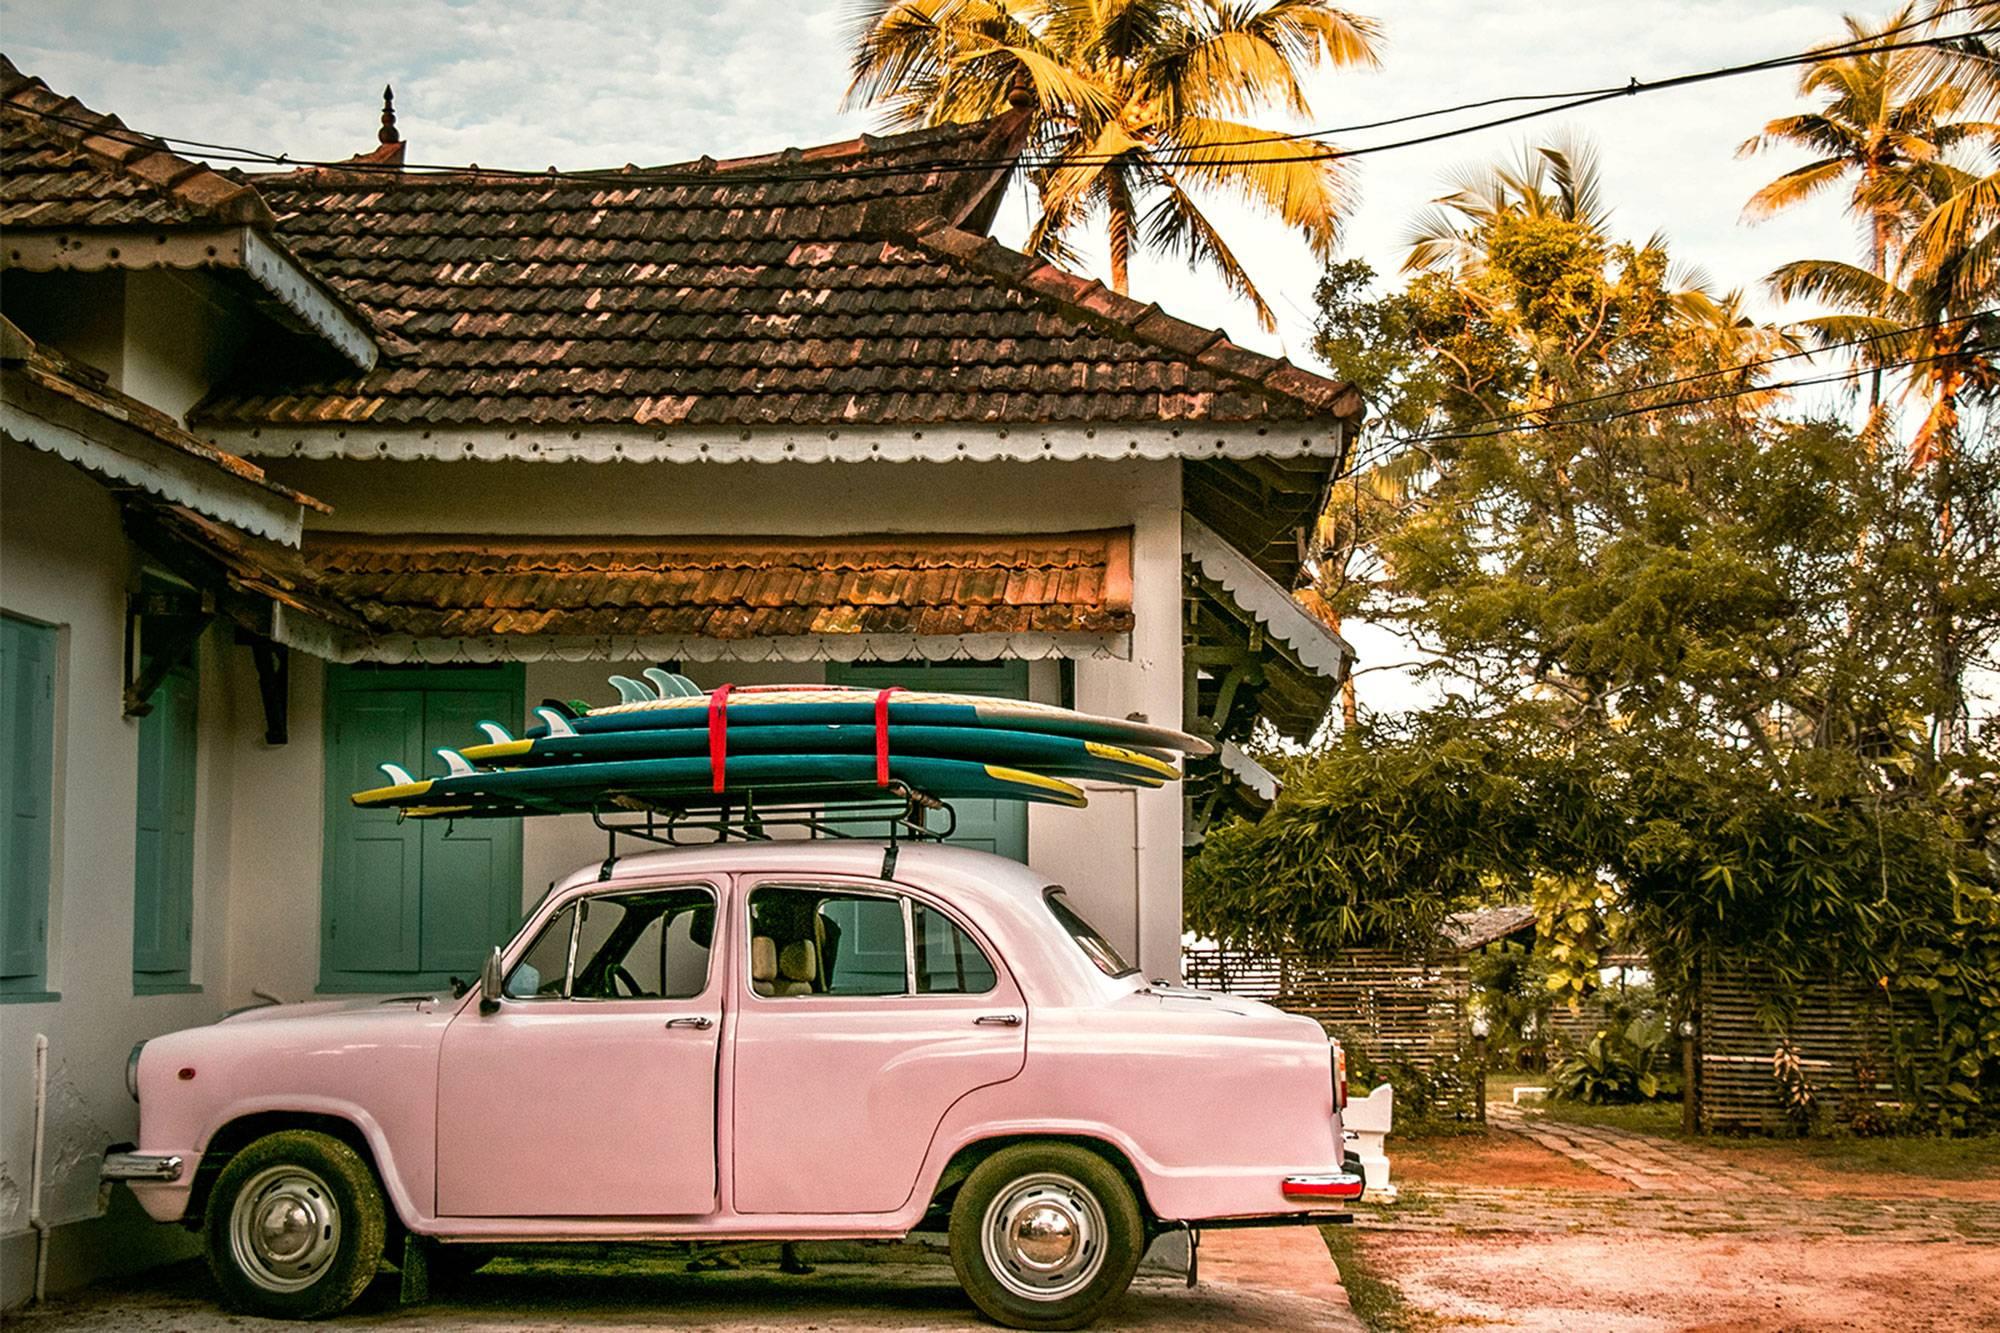 https://www.soulandsurf.com/wp-content/uploads/2021/09/Retreatsindia-images-SS-Kerala-Website-10-stay.jpg